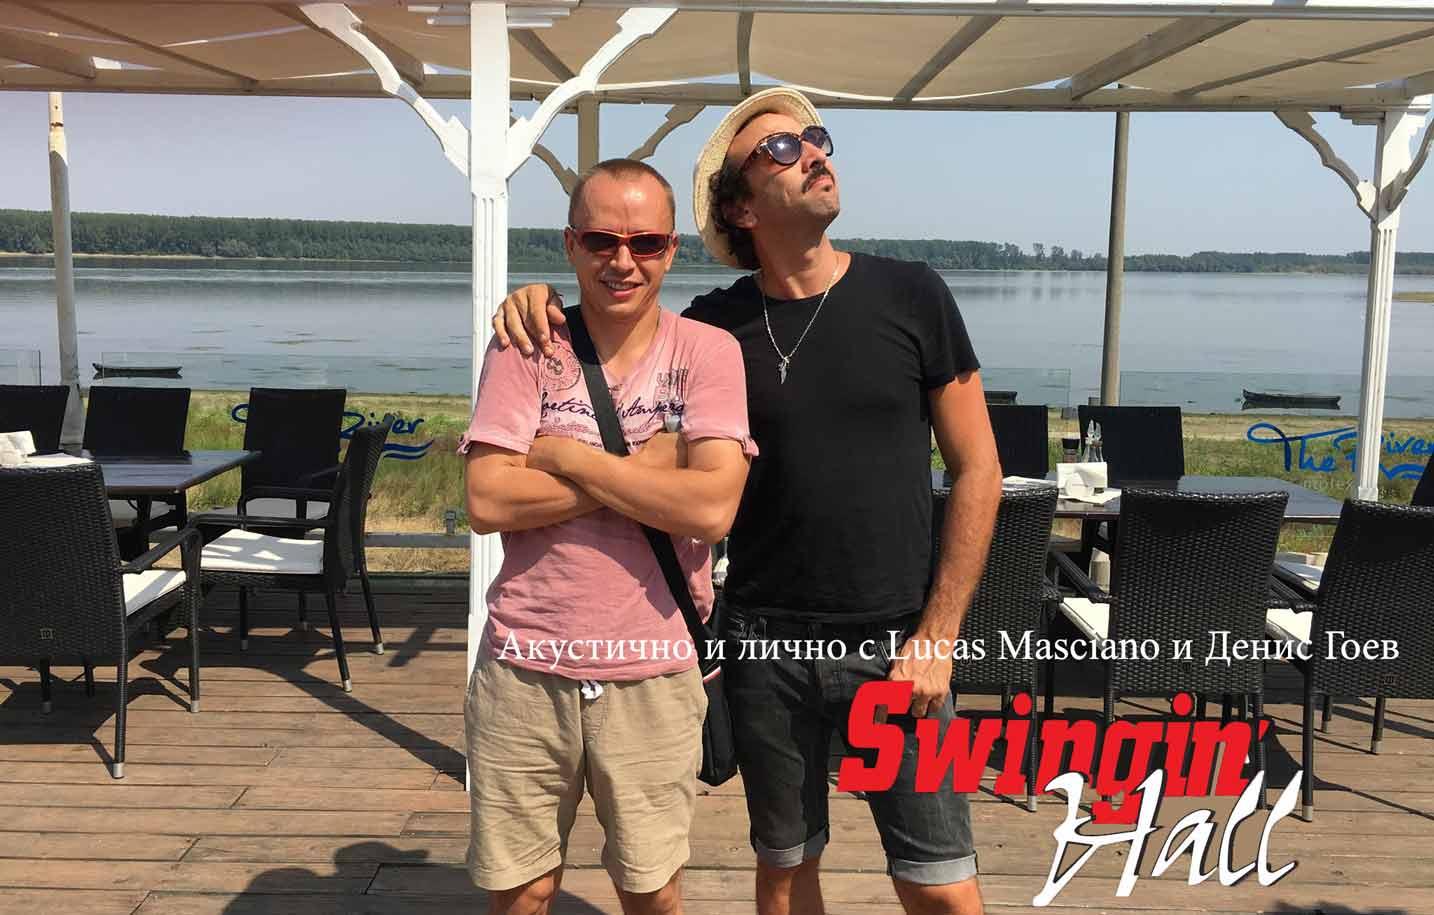 28 ноември Swingin' Hall | Акустично и лично с Lucas Masciano и Денис Гоев